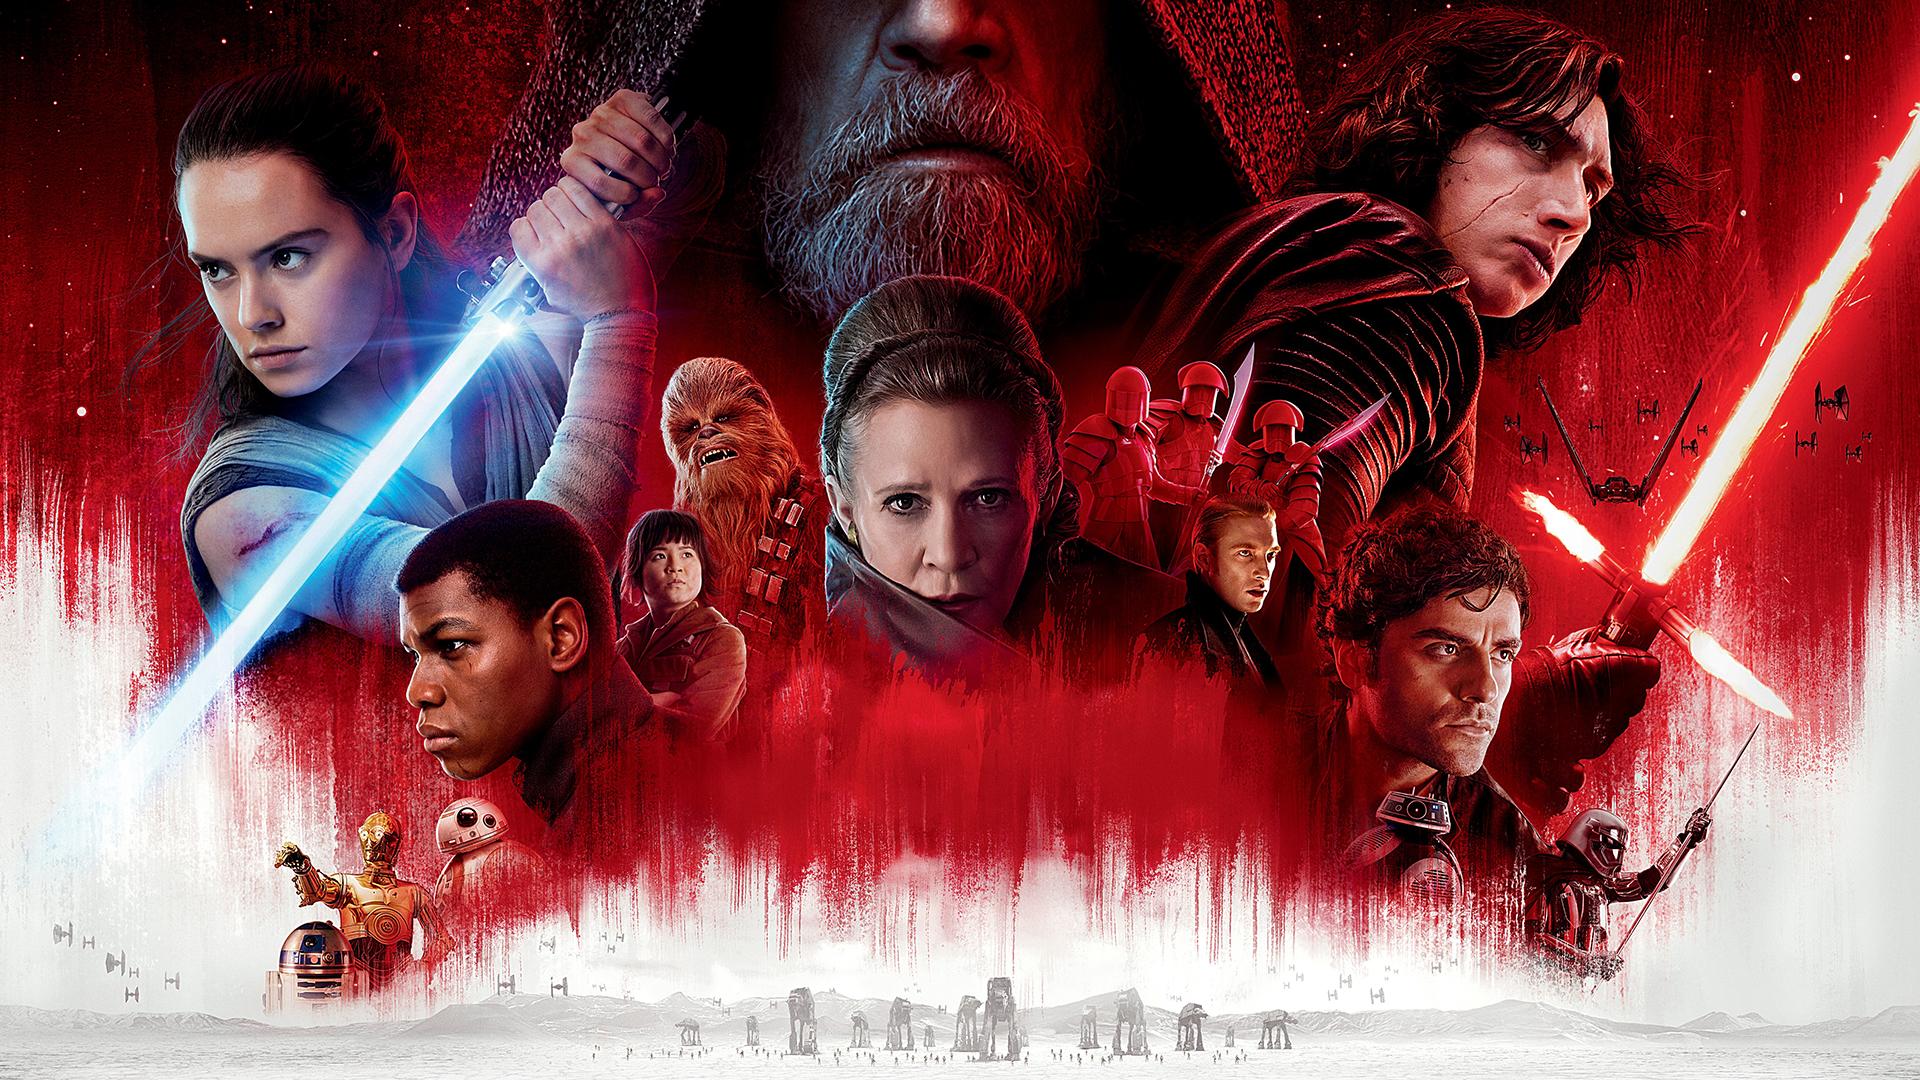 Wallpaper Star Wars The Last Jedi Kylo Ren Chewbacca Movie Poster 1920x1080 Grim1111 1180121 Hd Wallpapers Wallhere